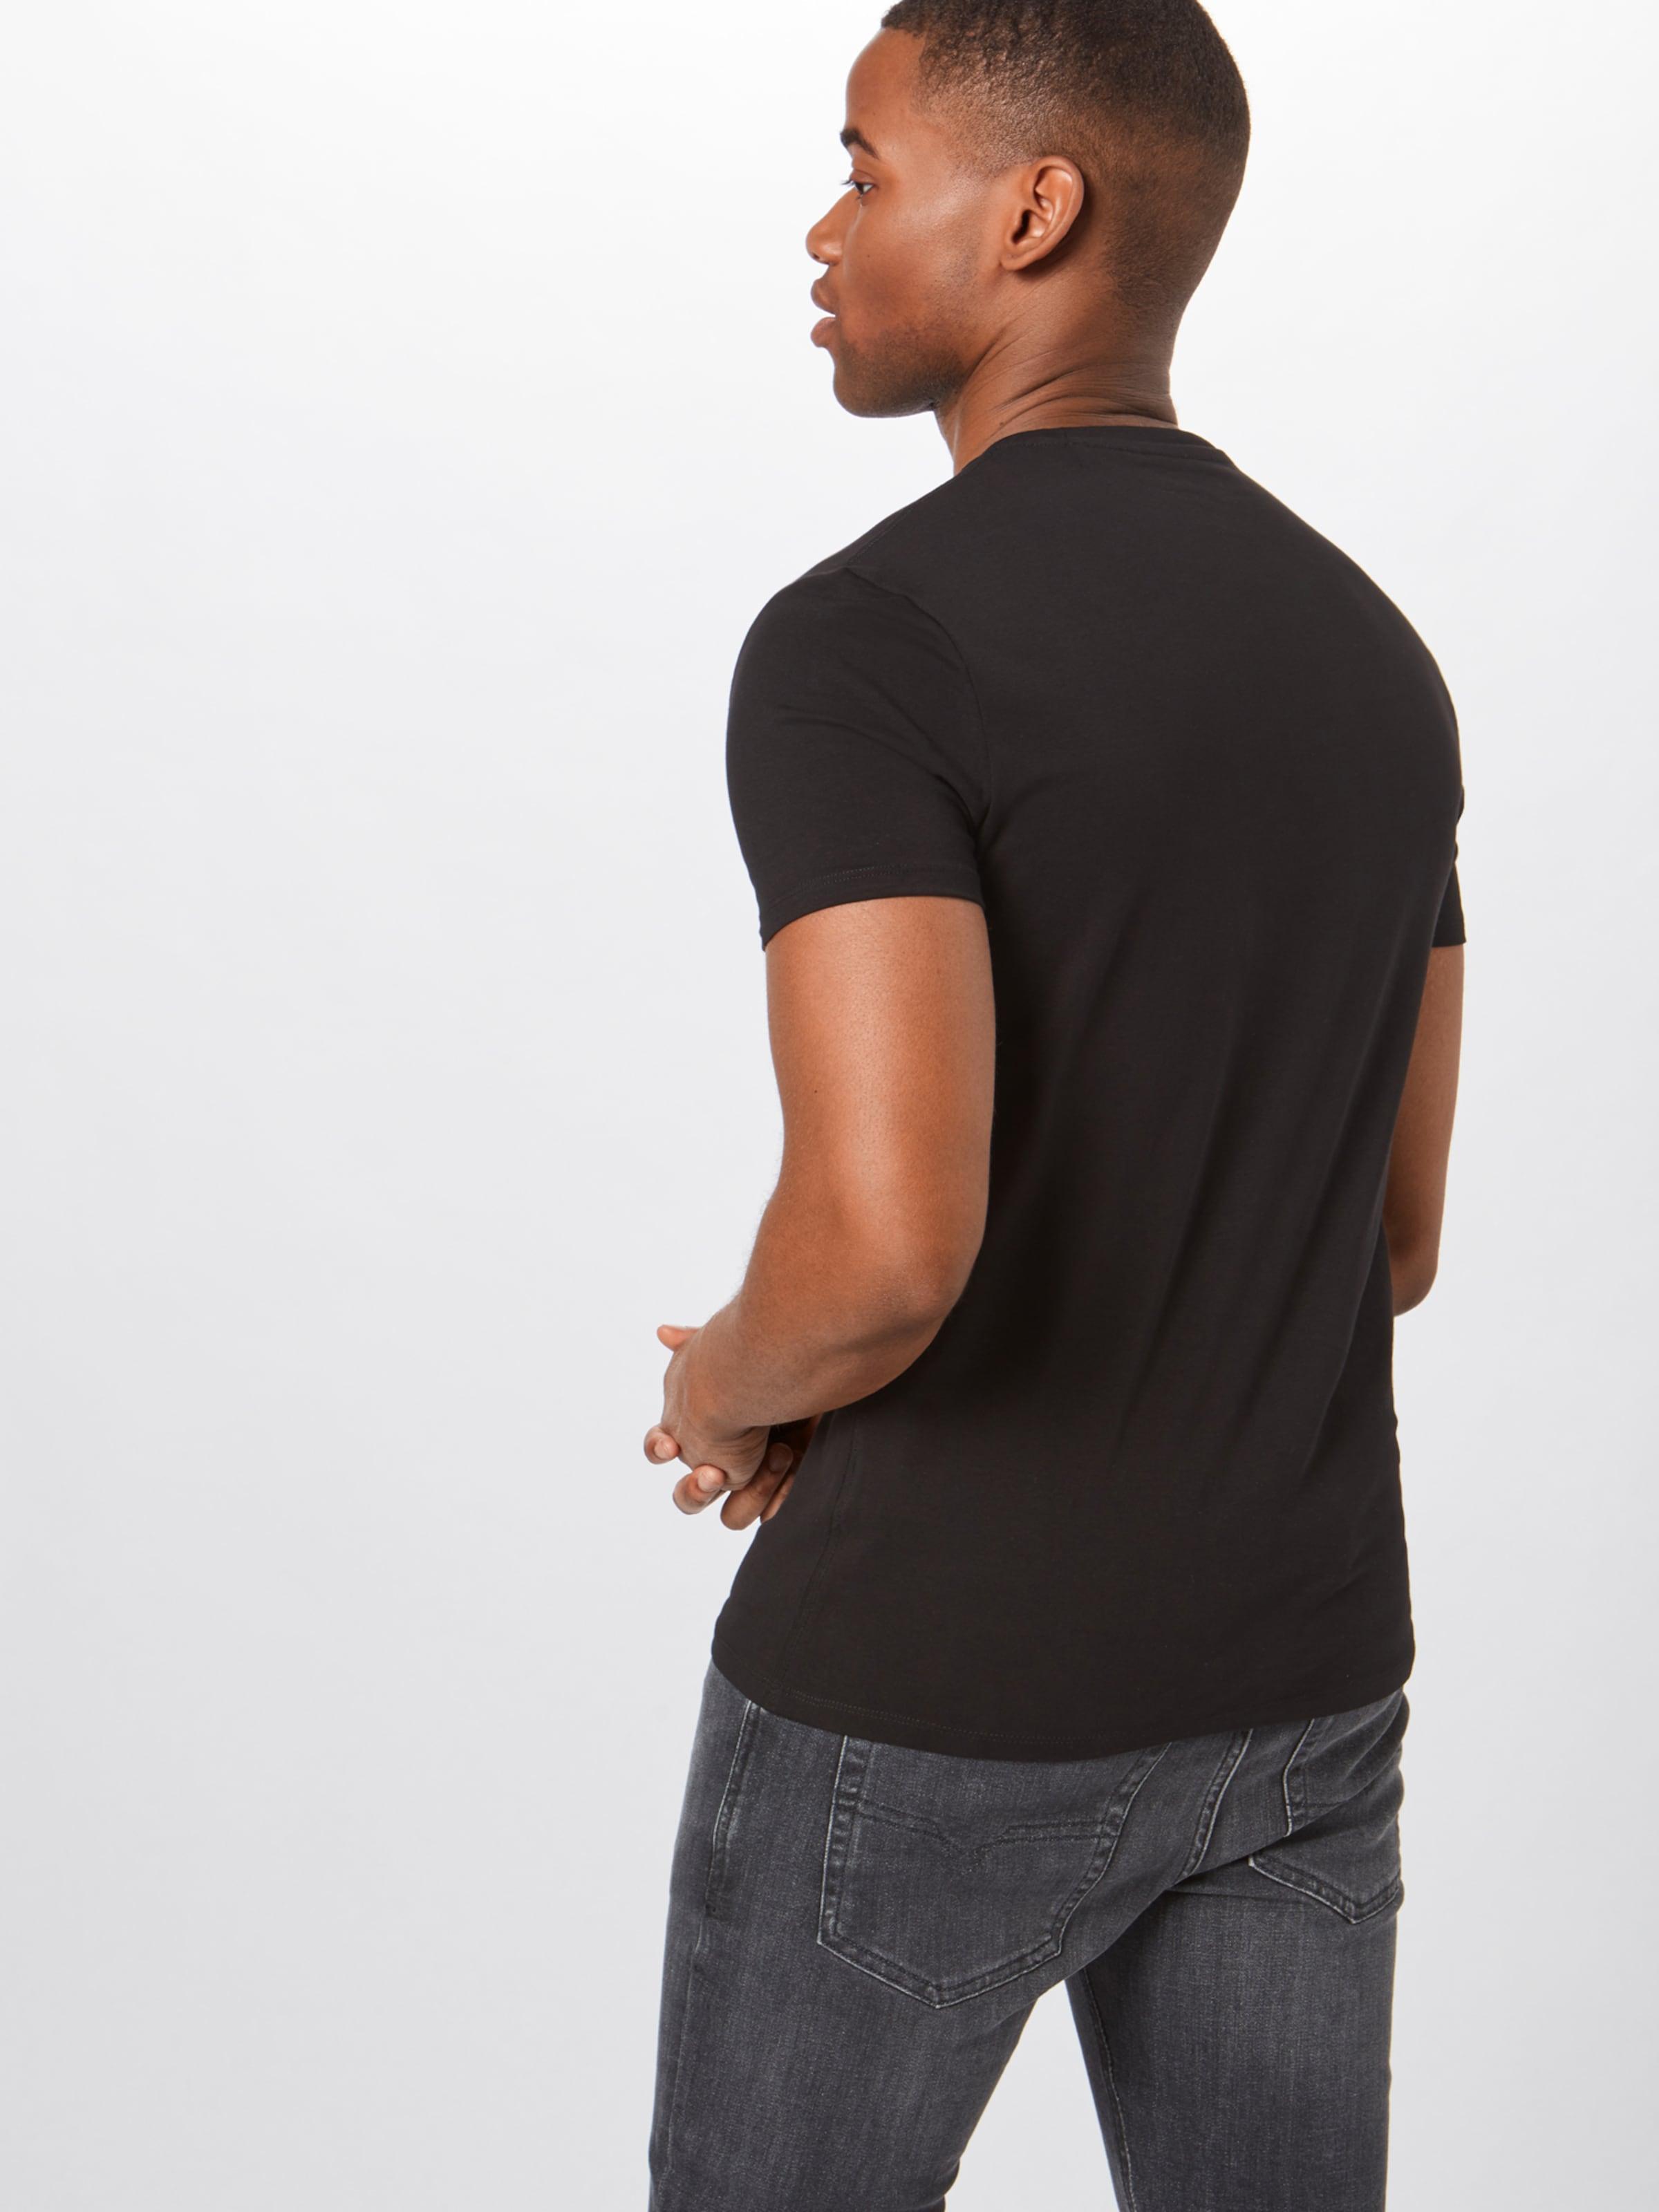 shirt T T Guess shirt Blanc Guess Guess En T En Blanc CsrxBthQd